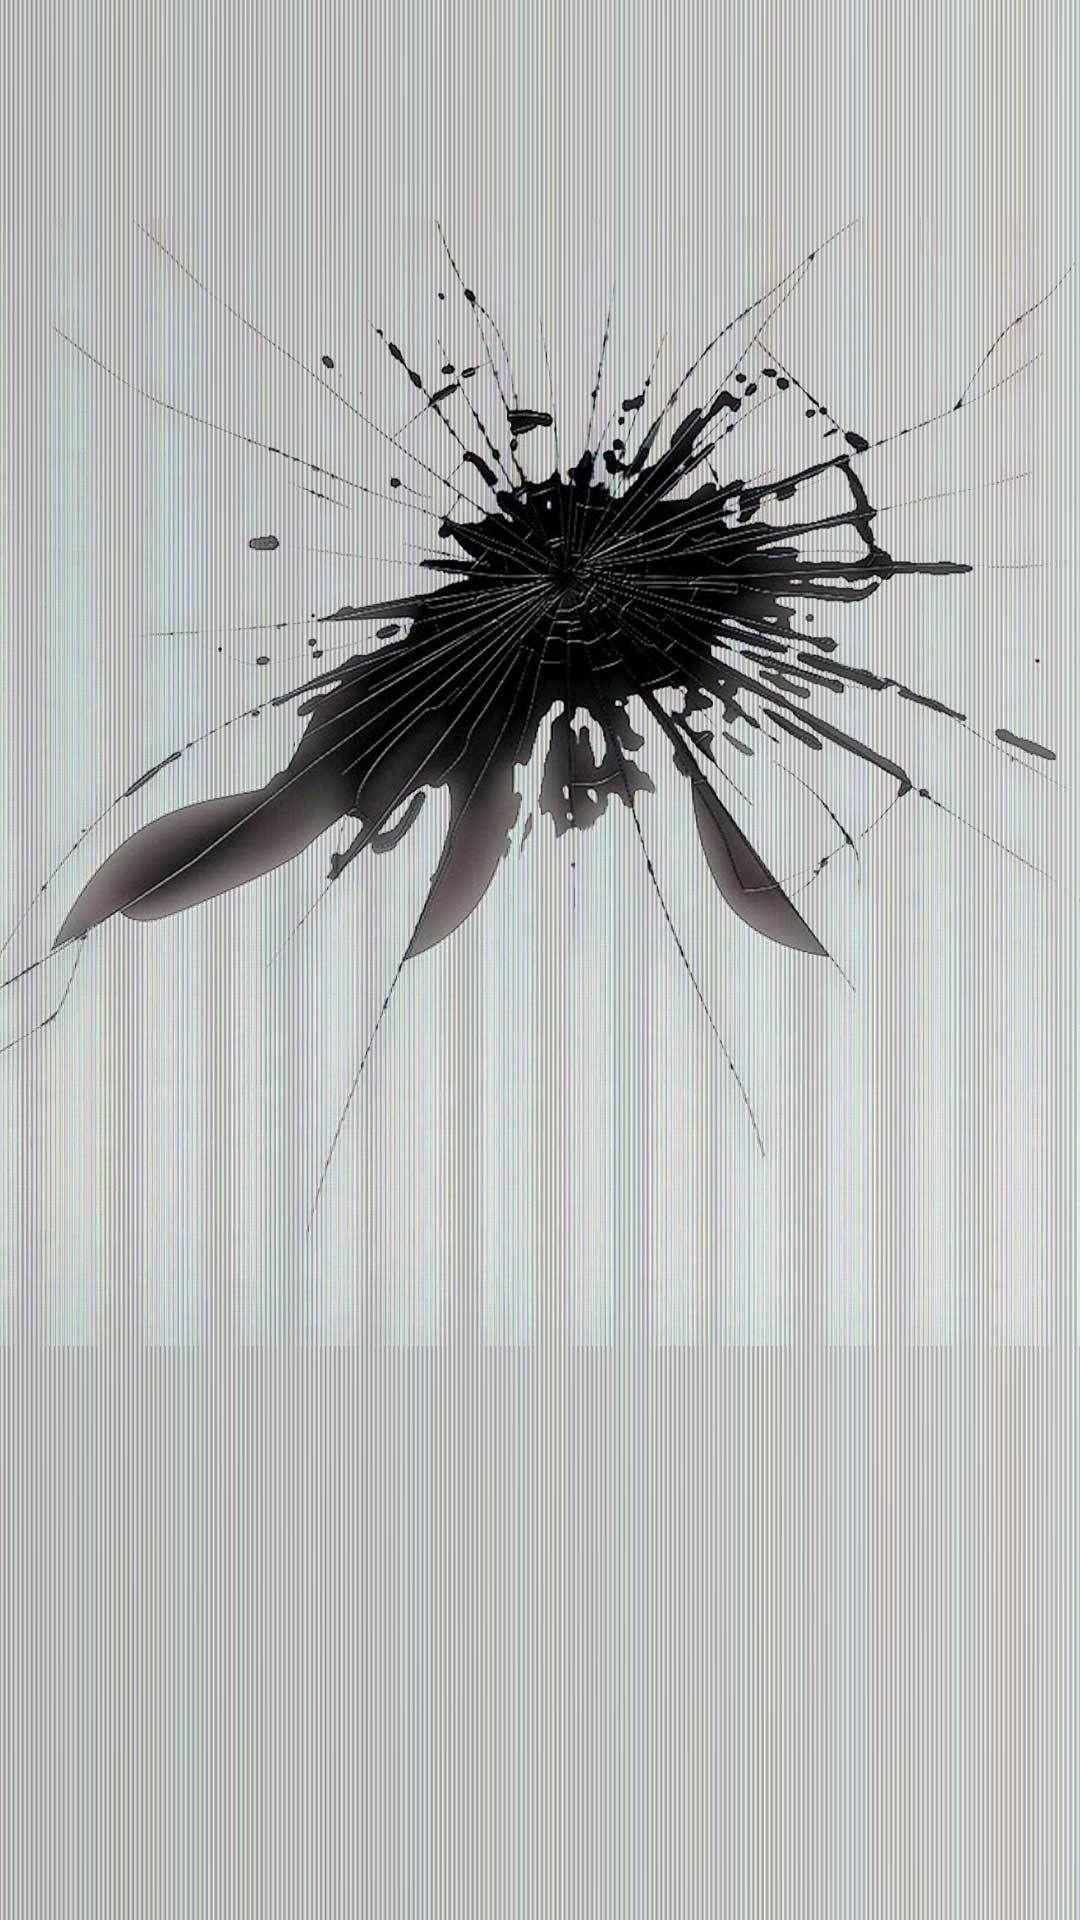 Cracked Screen hd wallpaper